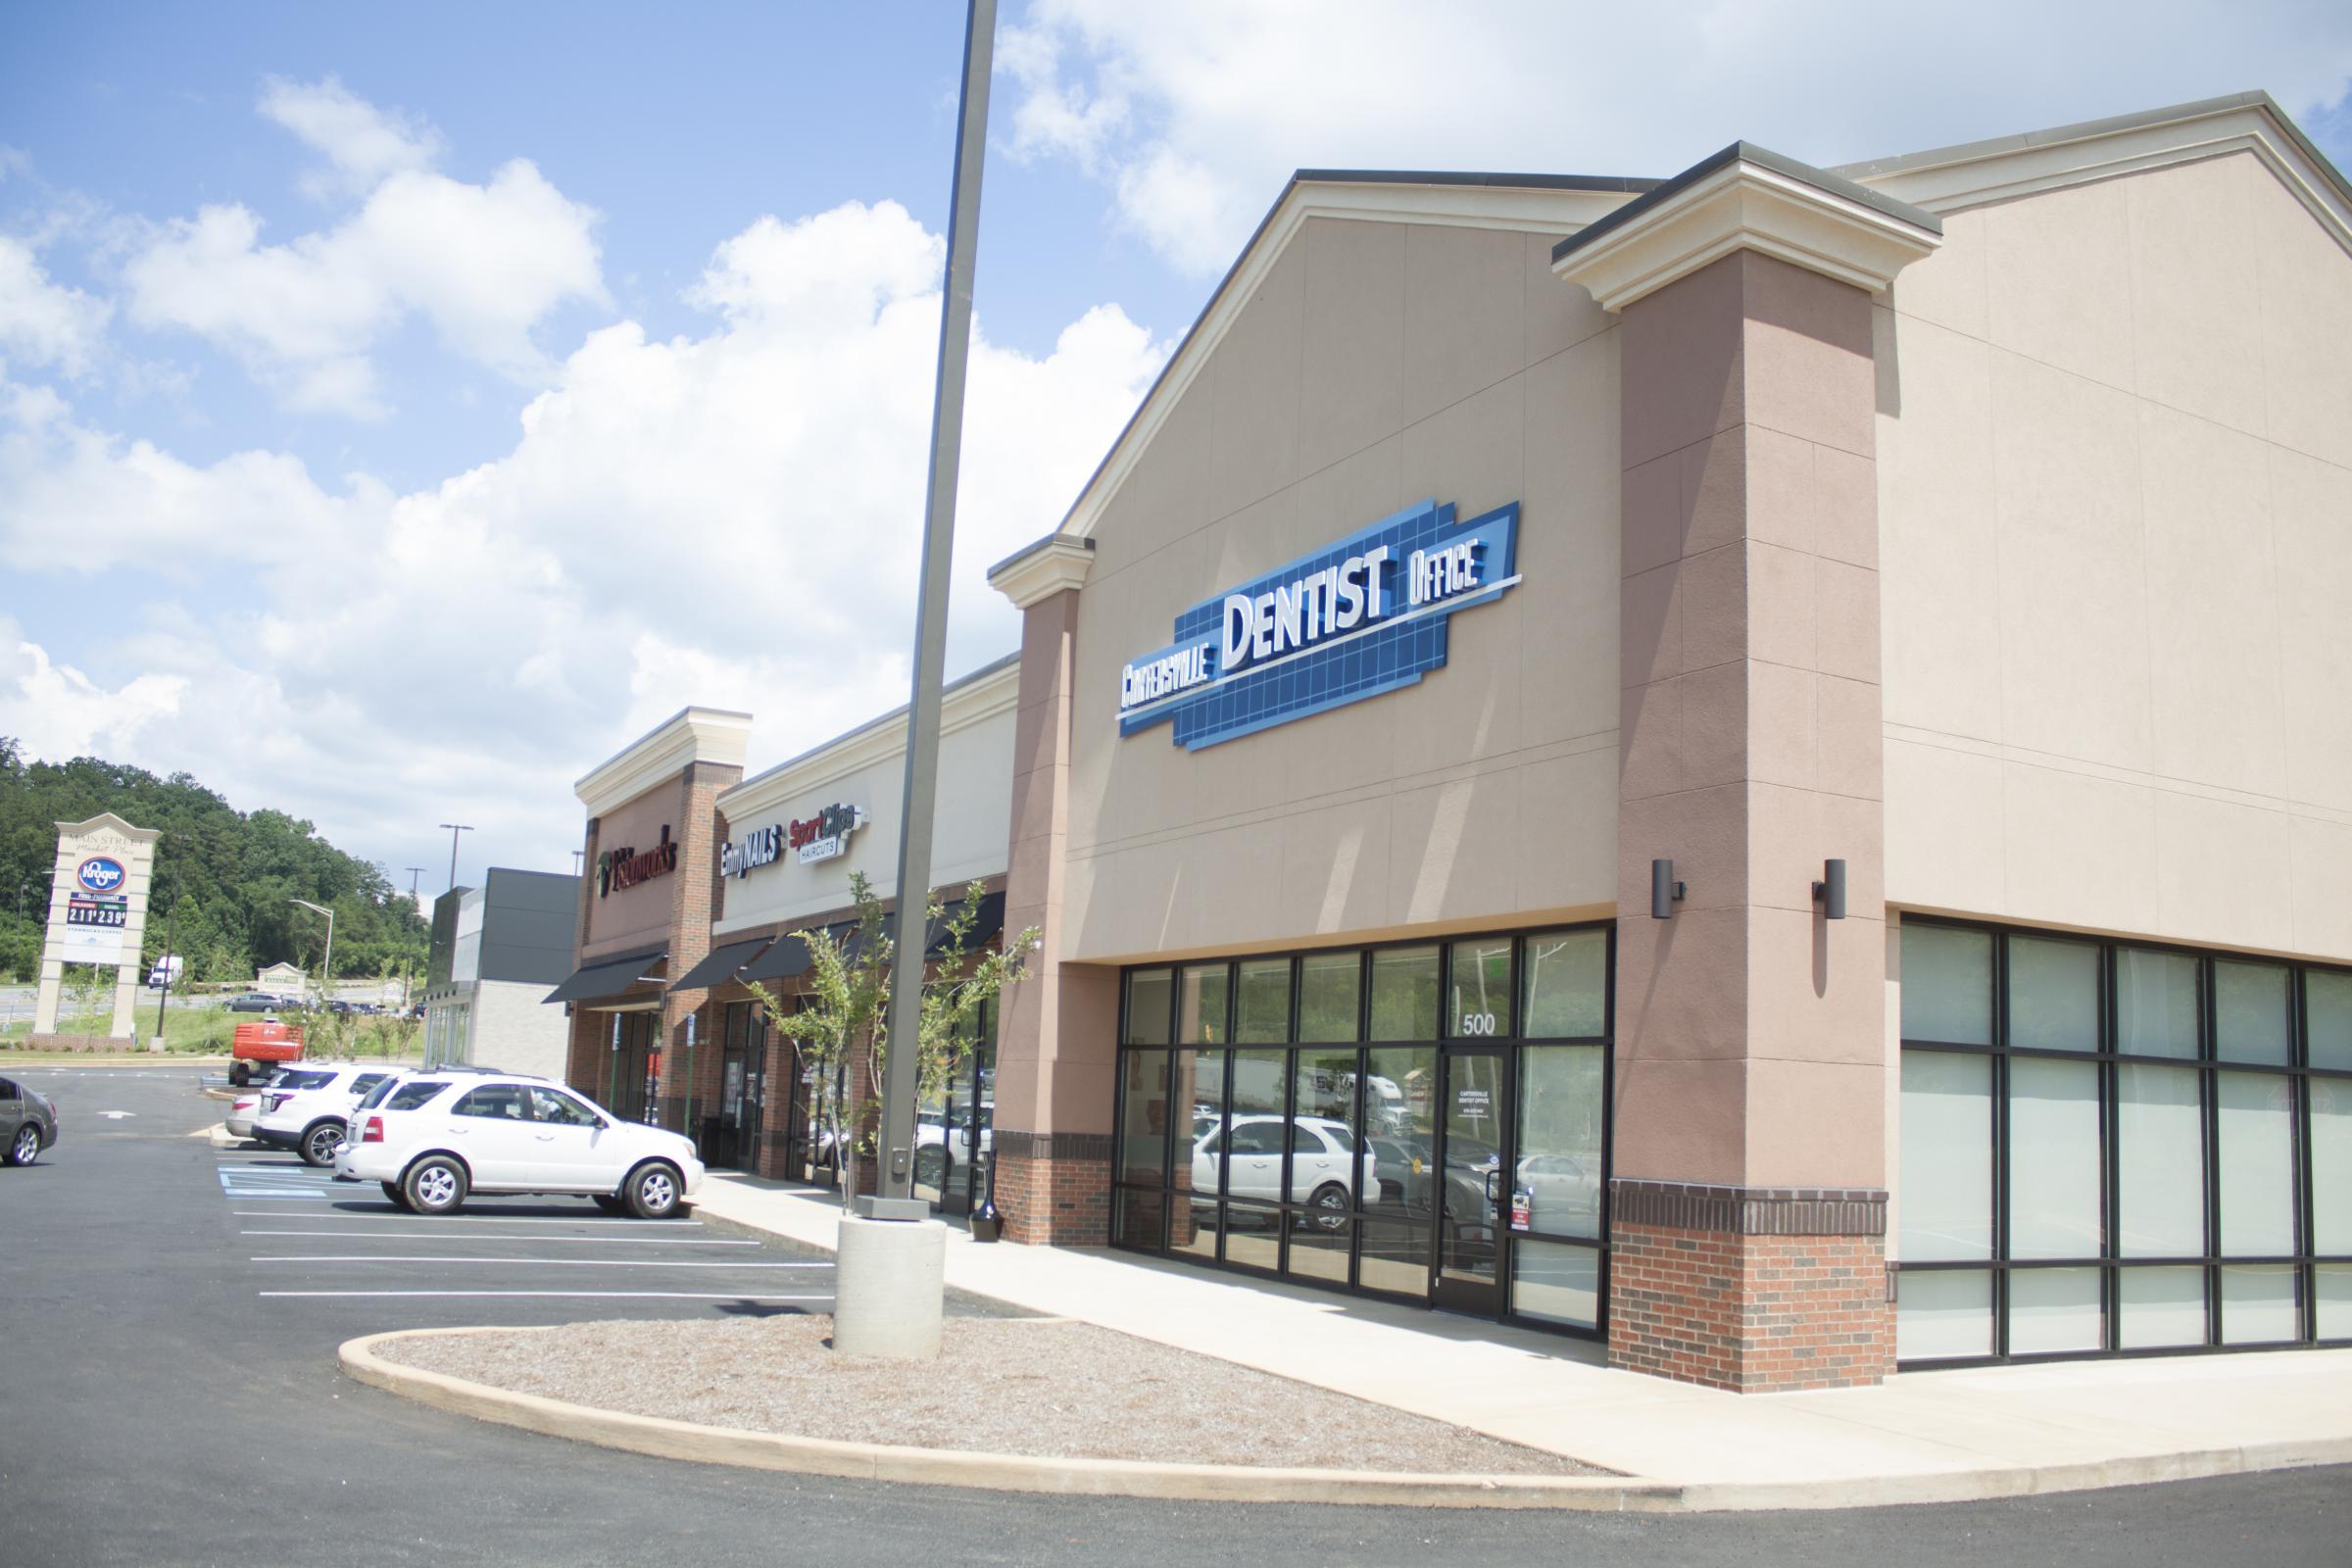 Cartersville Dentist Office image 0